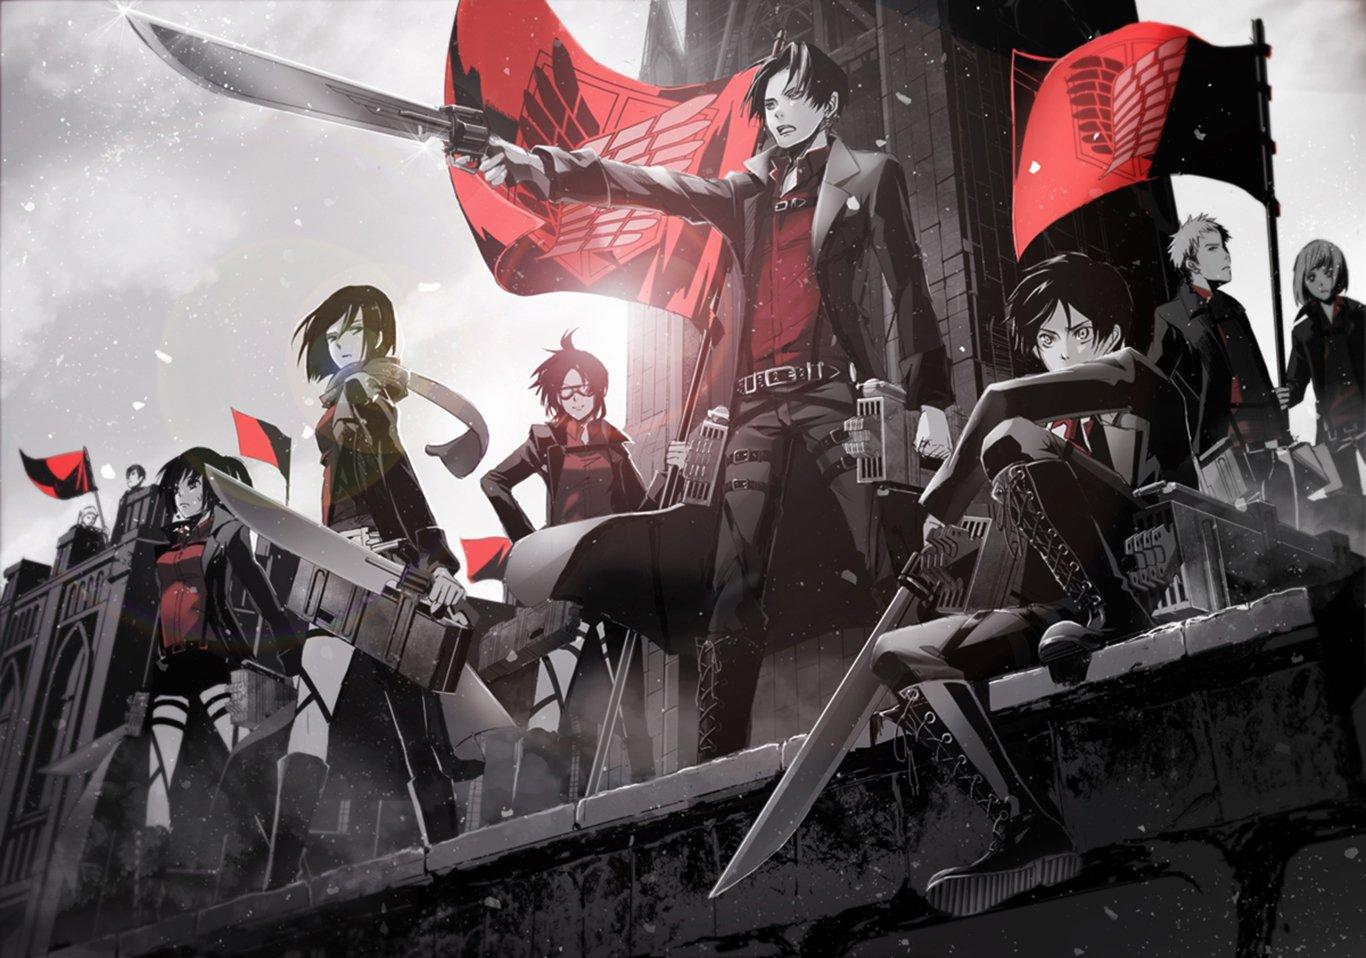 Anime - Attack On Titan  Mikasa Ackerman Eren Yeager Levi Ackerman Hange Zoë Sasha Blouse Petra Ral Jean Kirstein Bertholdt Fubar Armin Arlert Wallpaper